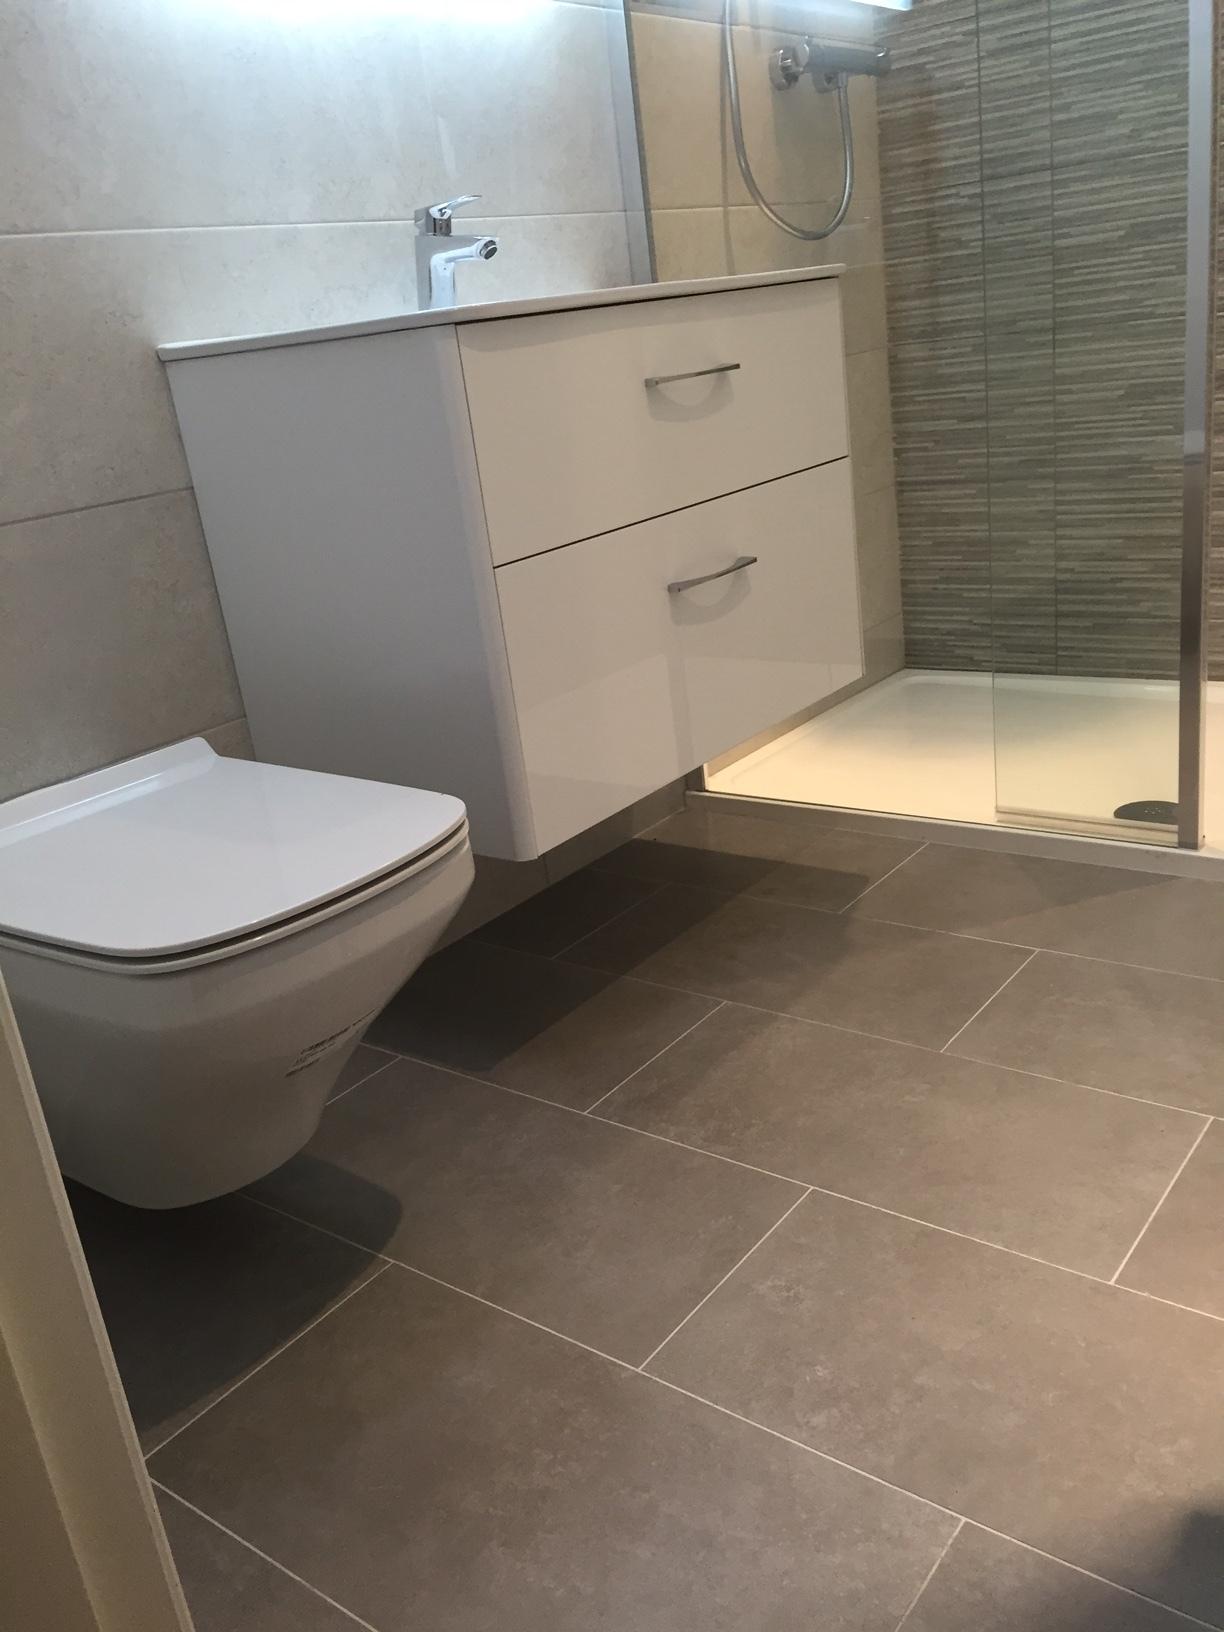 Bathroom Renovation Kildare wc and ensuite design - rathangan, kildare | cleary bathroom design